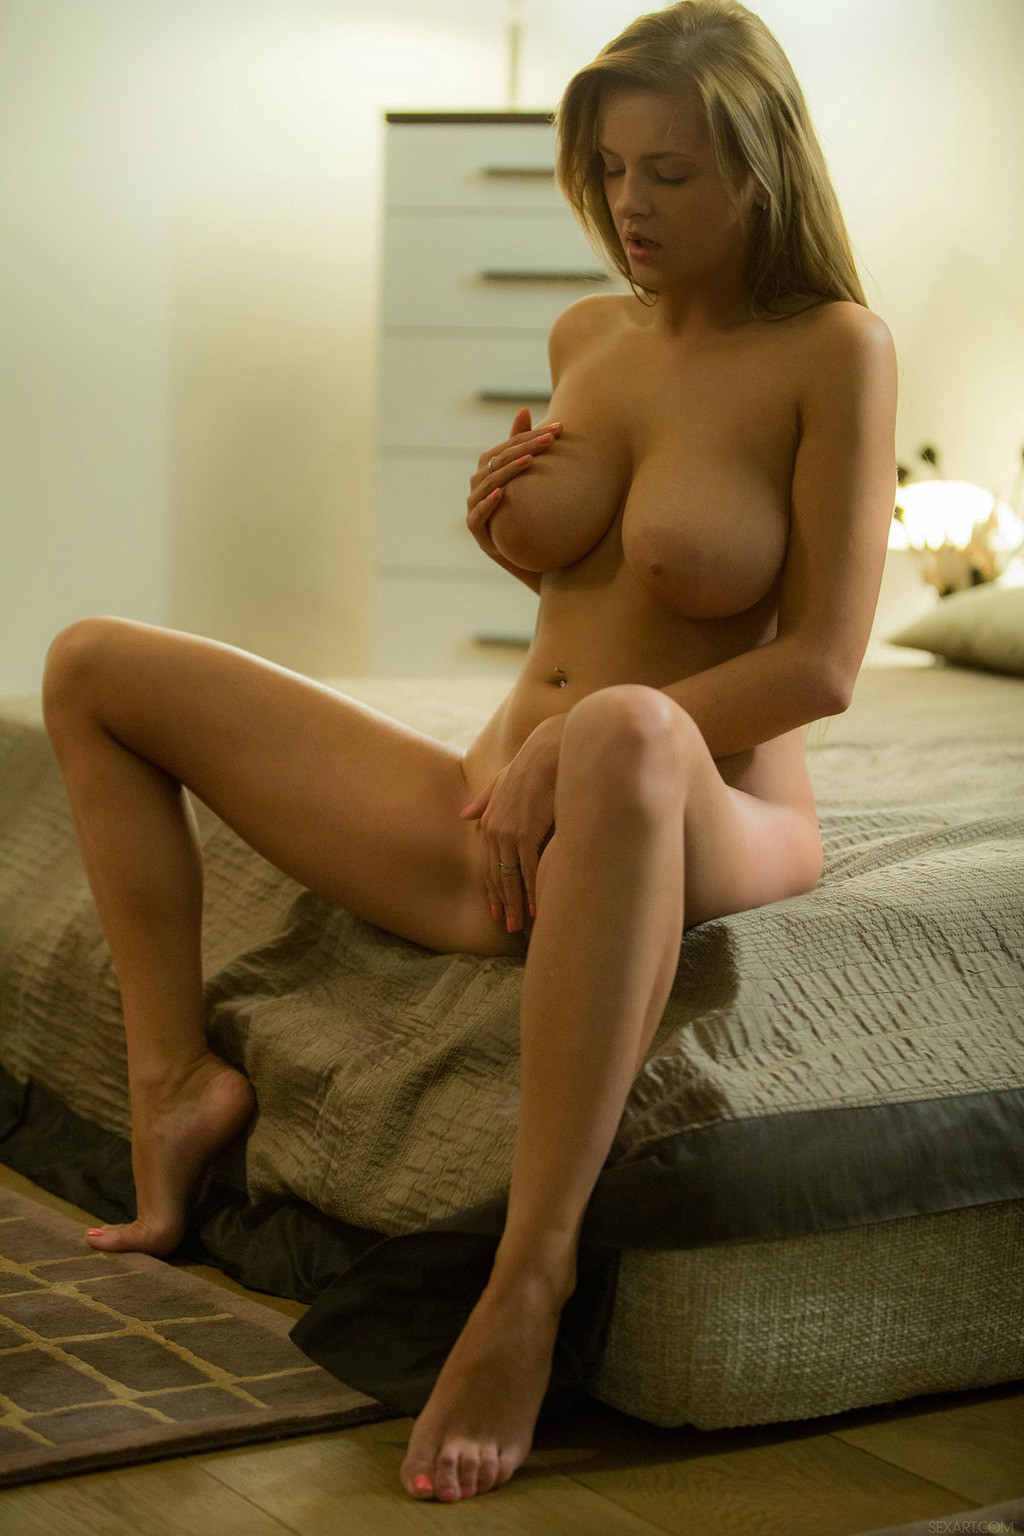 huge-boobs-tits-naked-mix-vol5-97